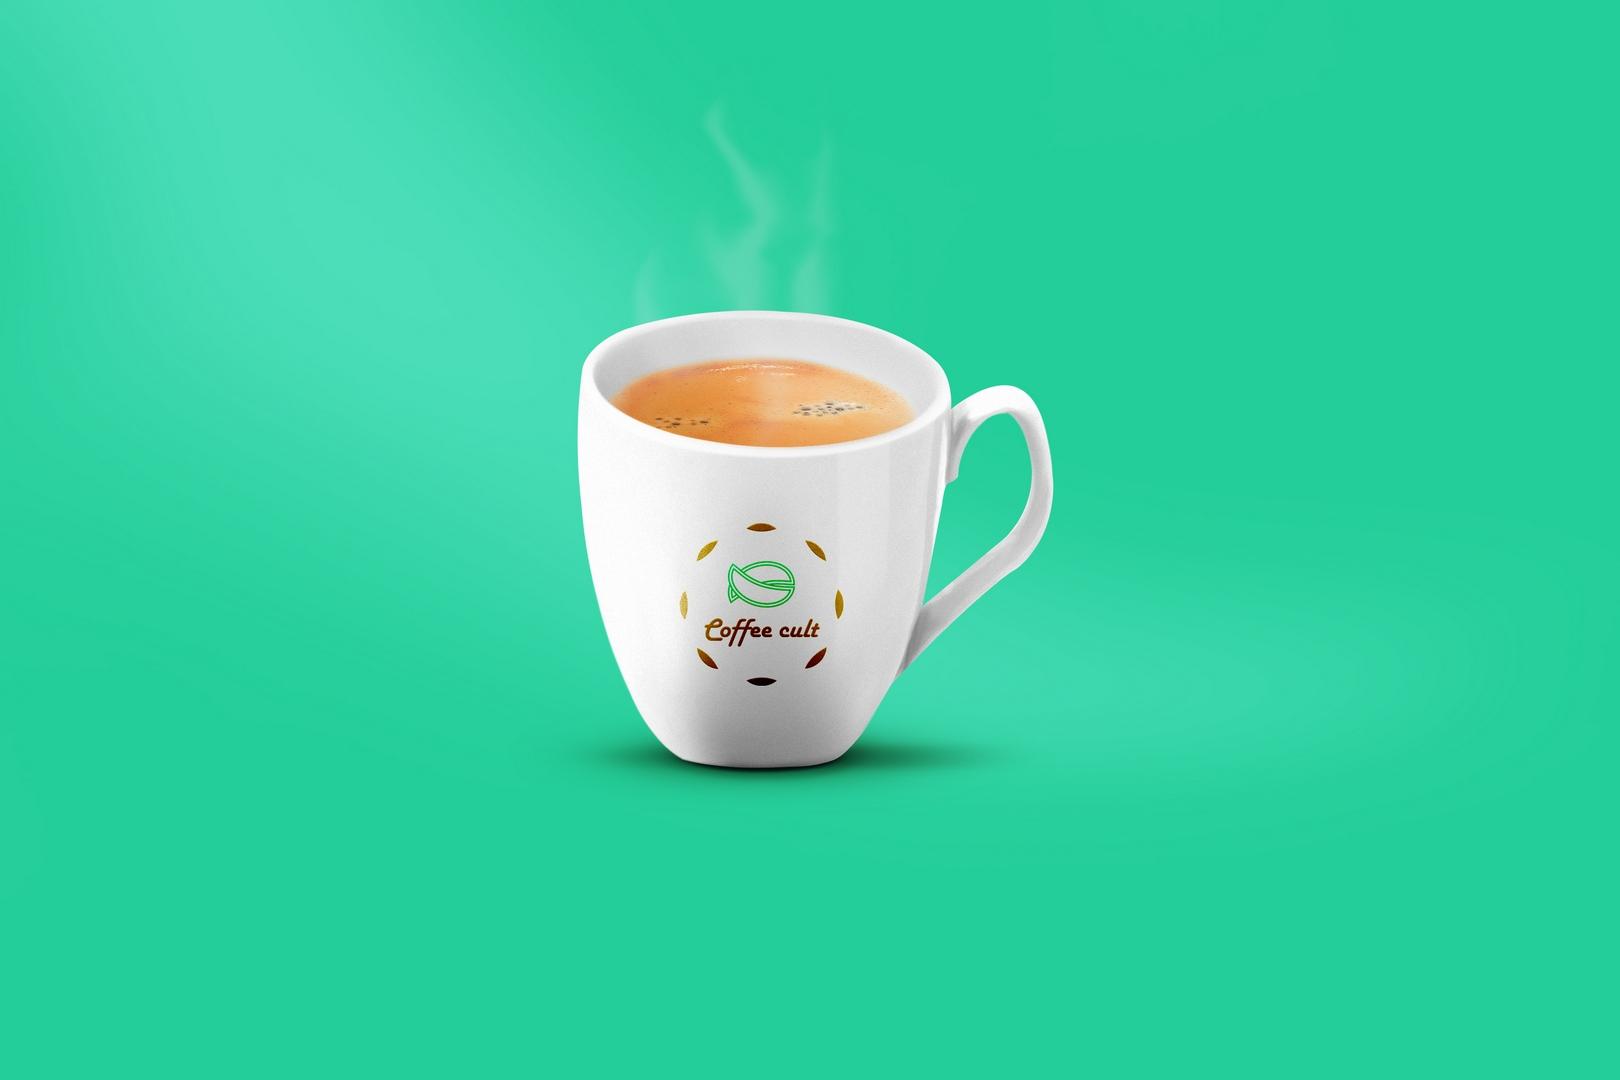 Логотип и фирменный стиль для компании COFFEE CULT фото f_5525bc41d6e13dc2.jpg